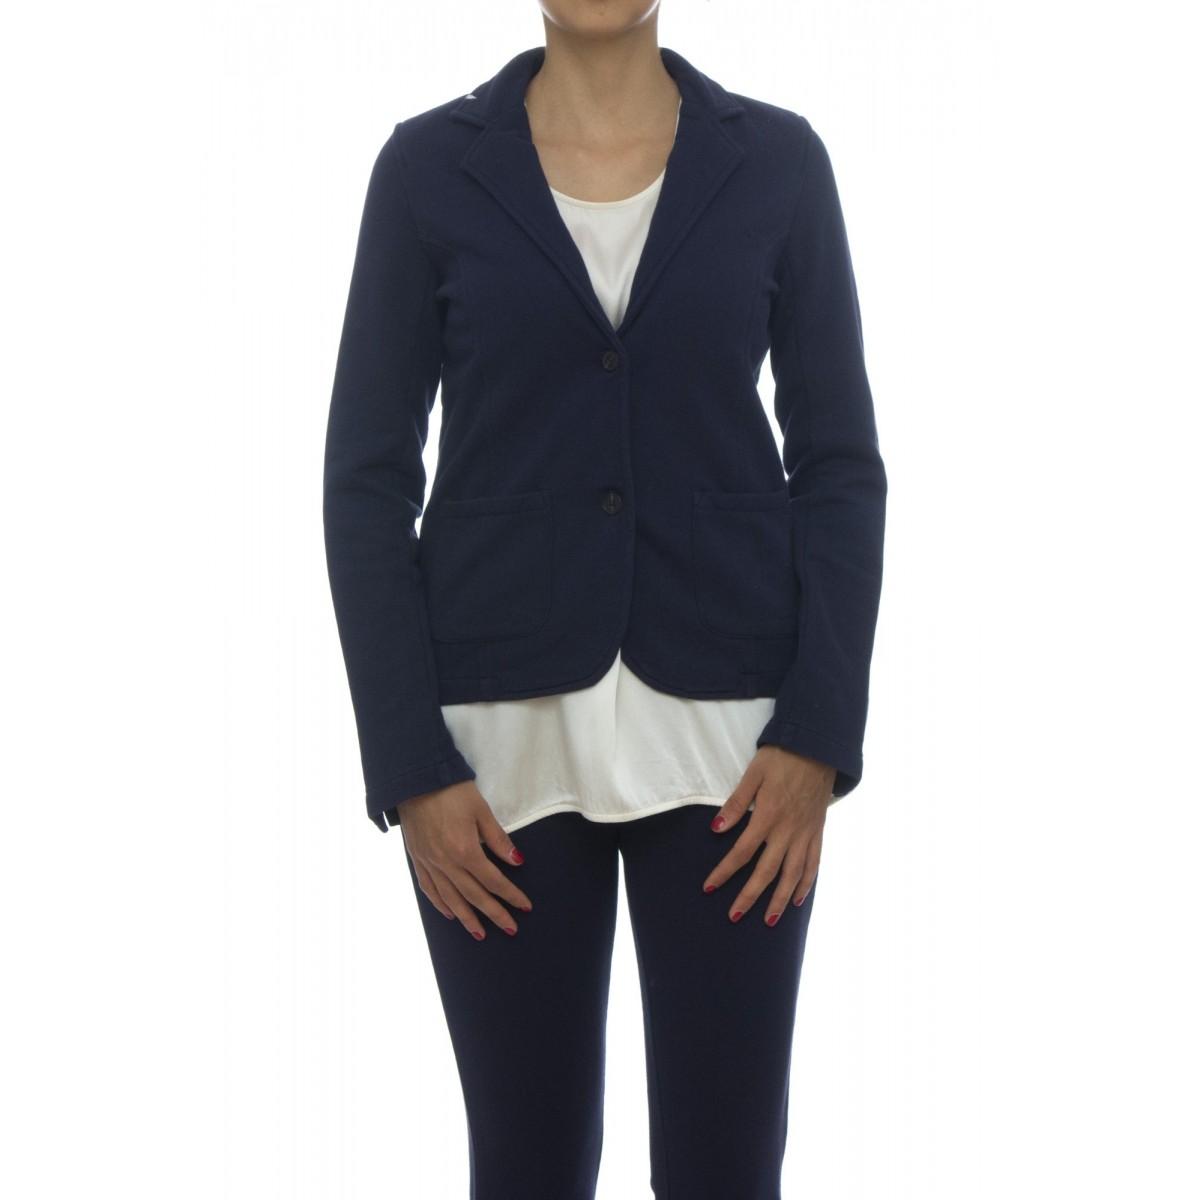 Felpa donna - 27217 giacchina in felpa